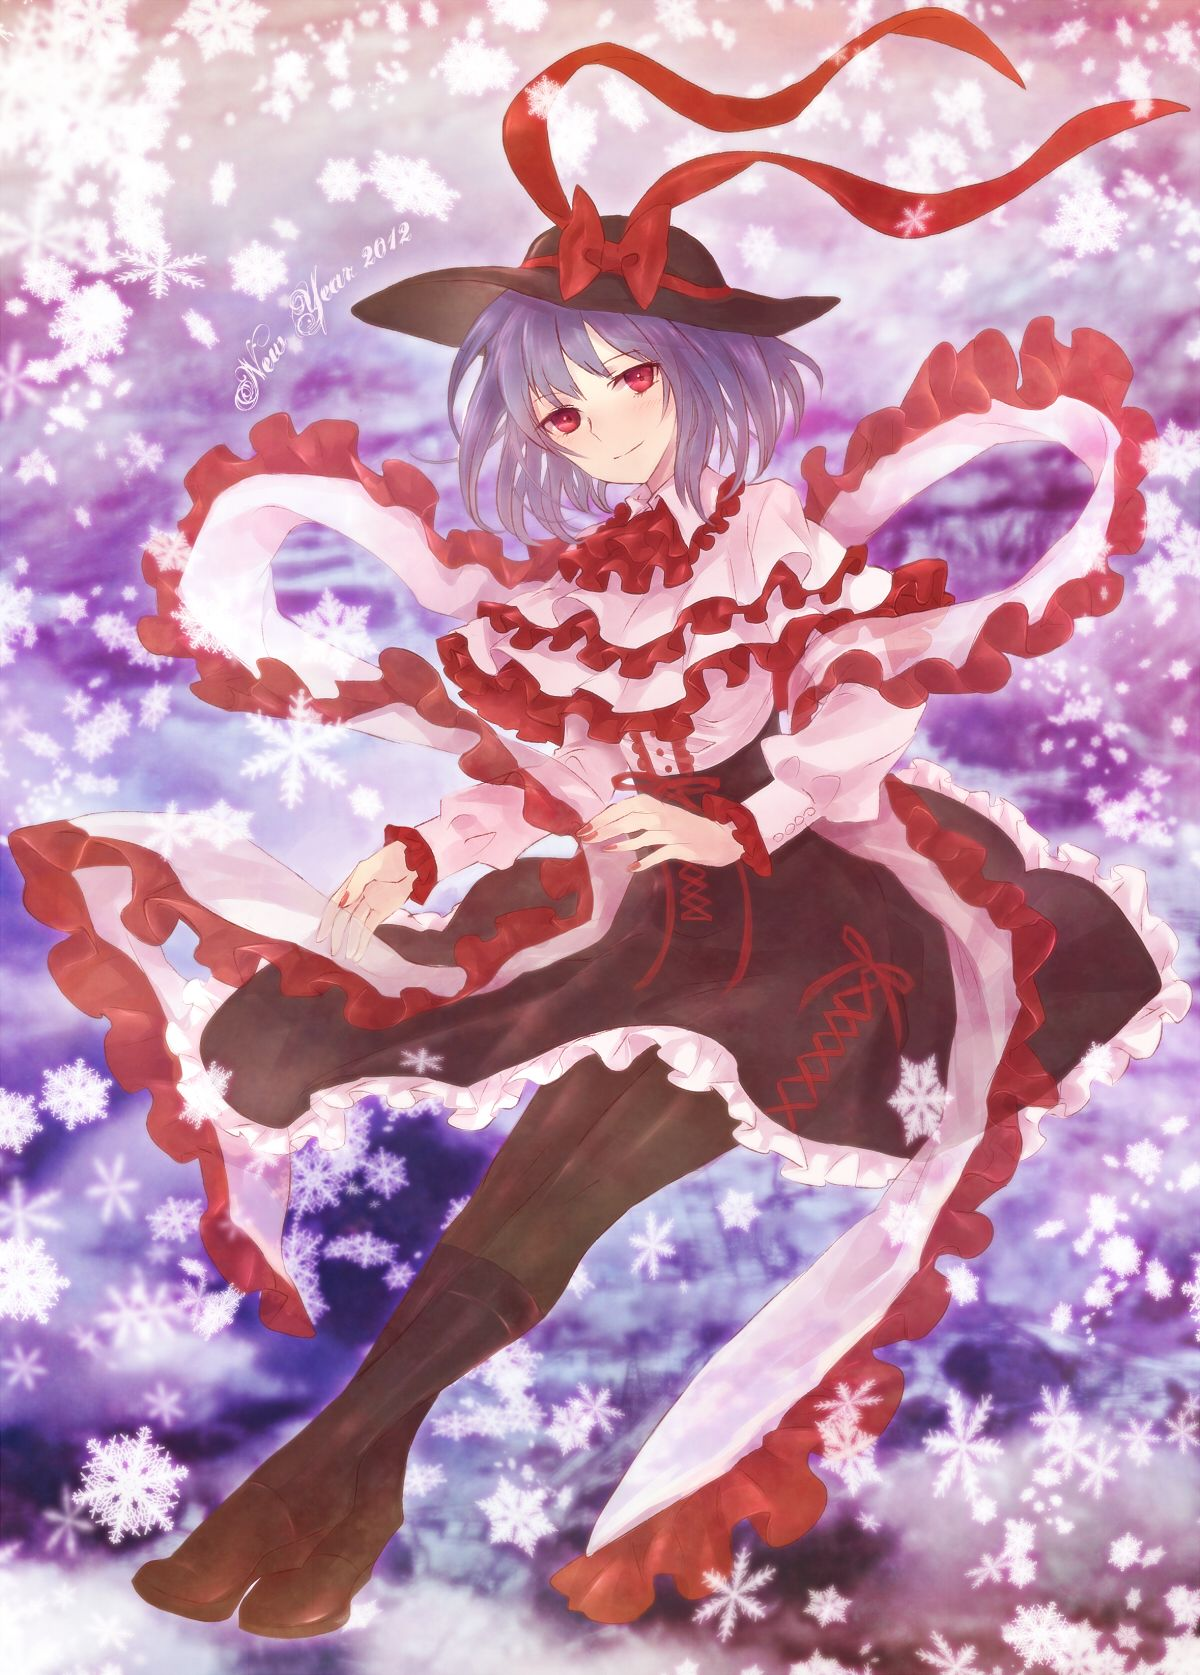 touhou part 335 qhbgef 東方 touhou anime images anime art